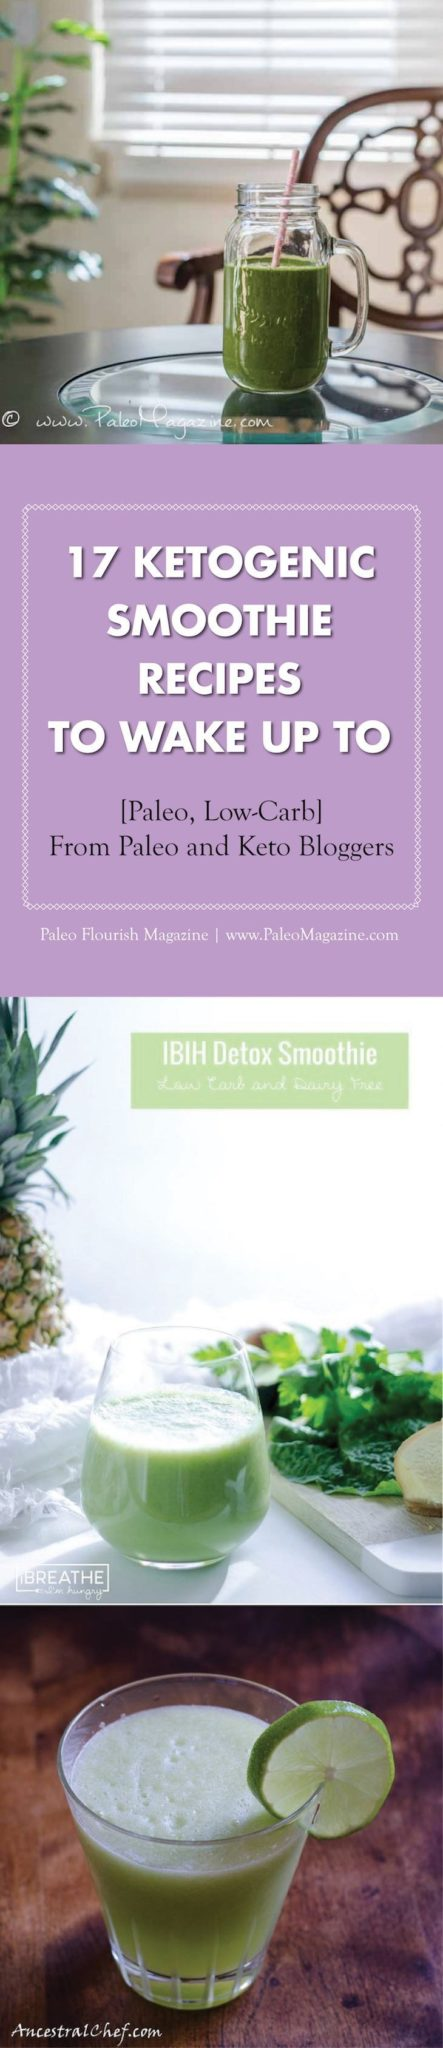 Paleo Ketogenic Smoothie Recipes #paleo #ketogenic #smoothie #recipes https://ketosummit.com/ketogenic-smoothie-recipes